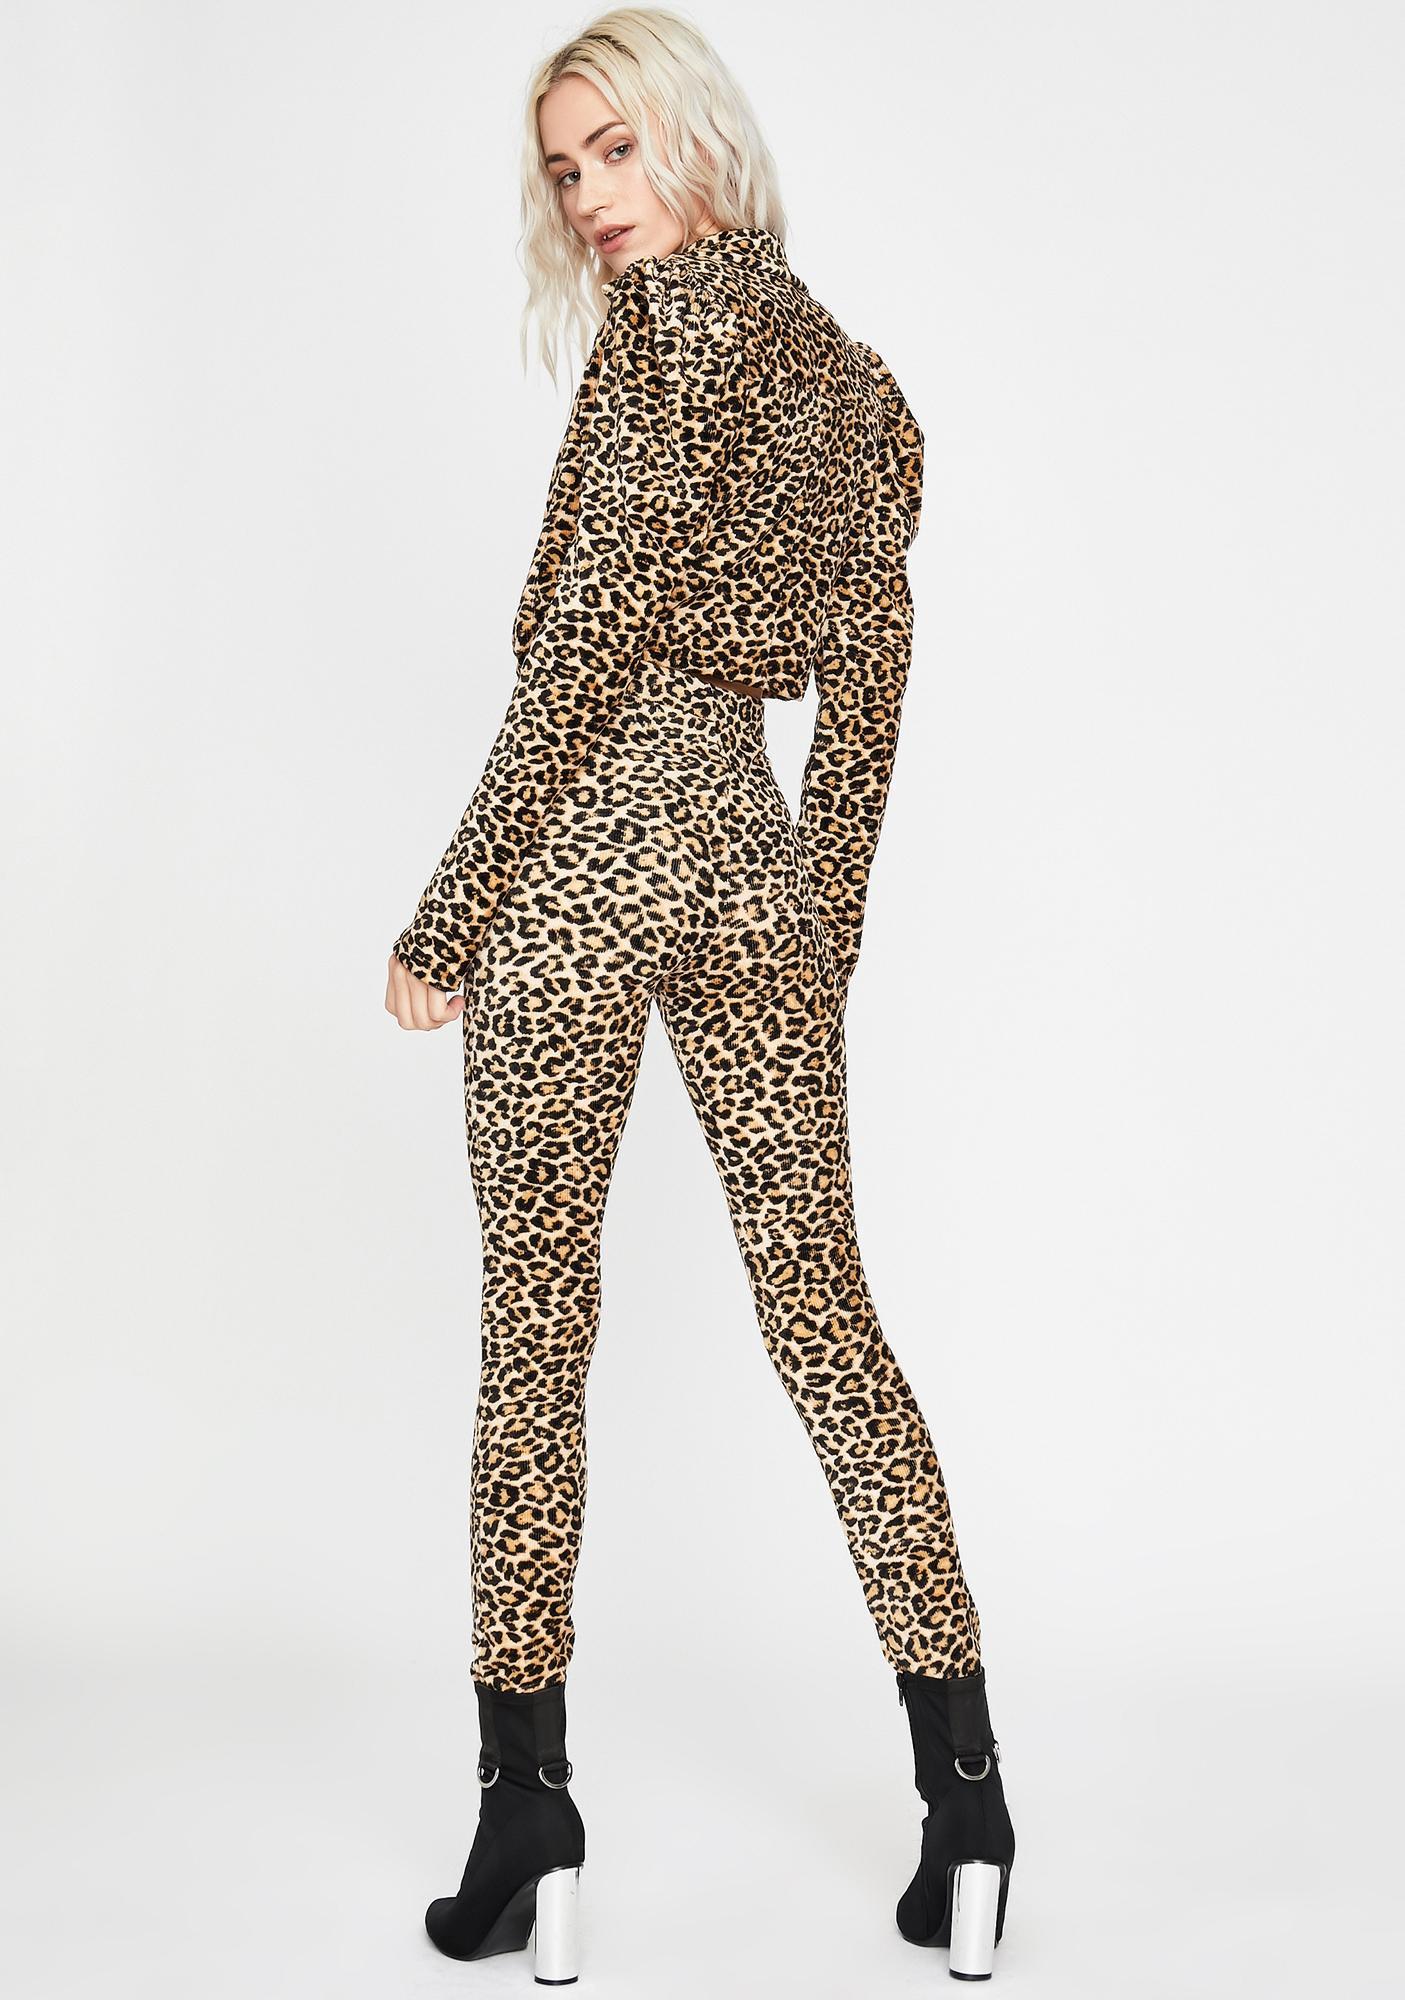 I Just Wanna Skinny Pants